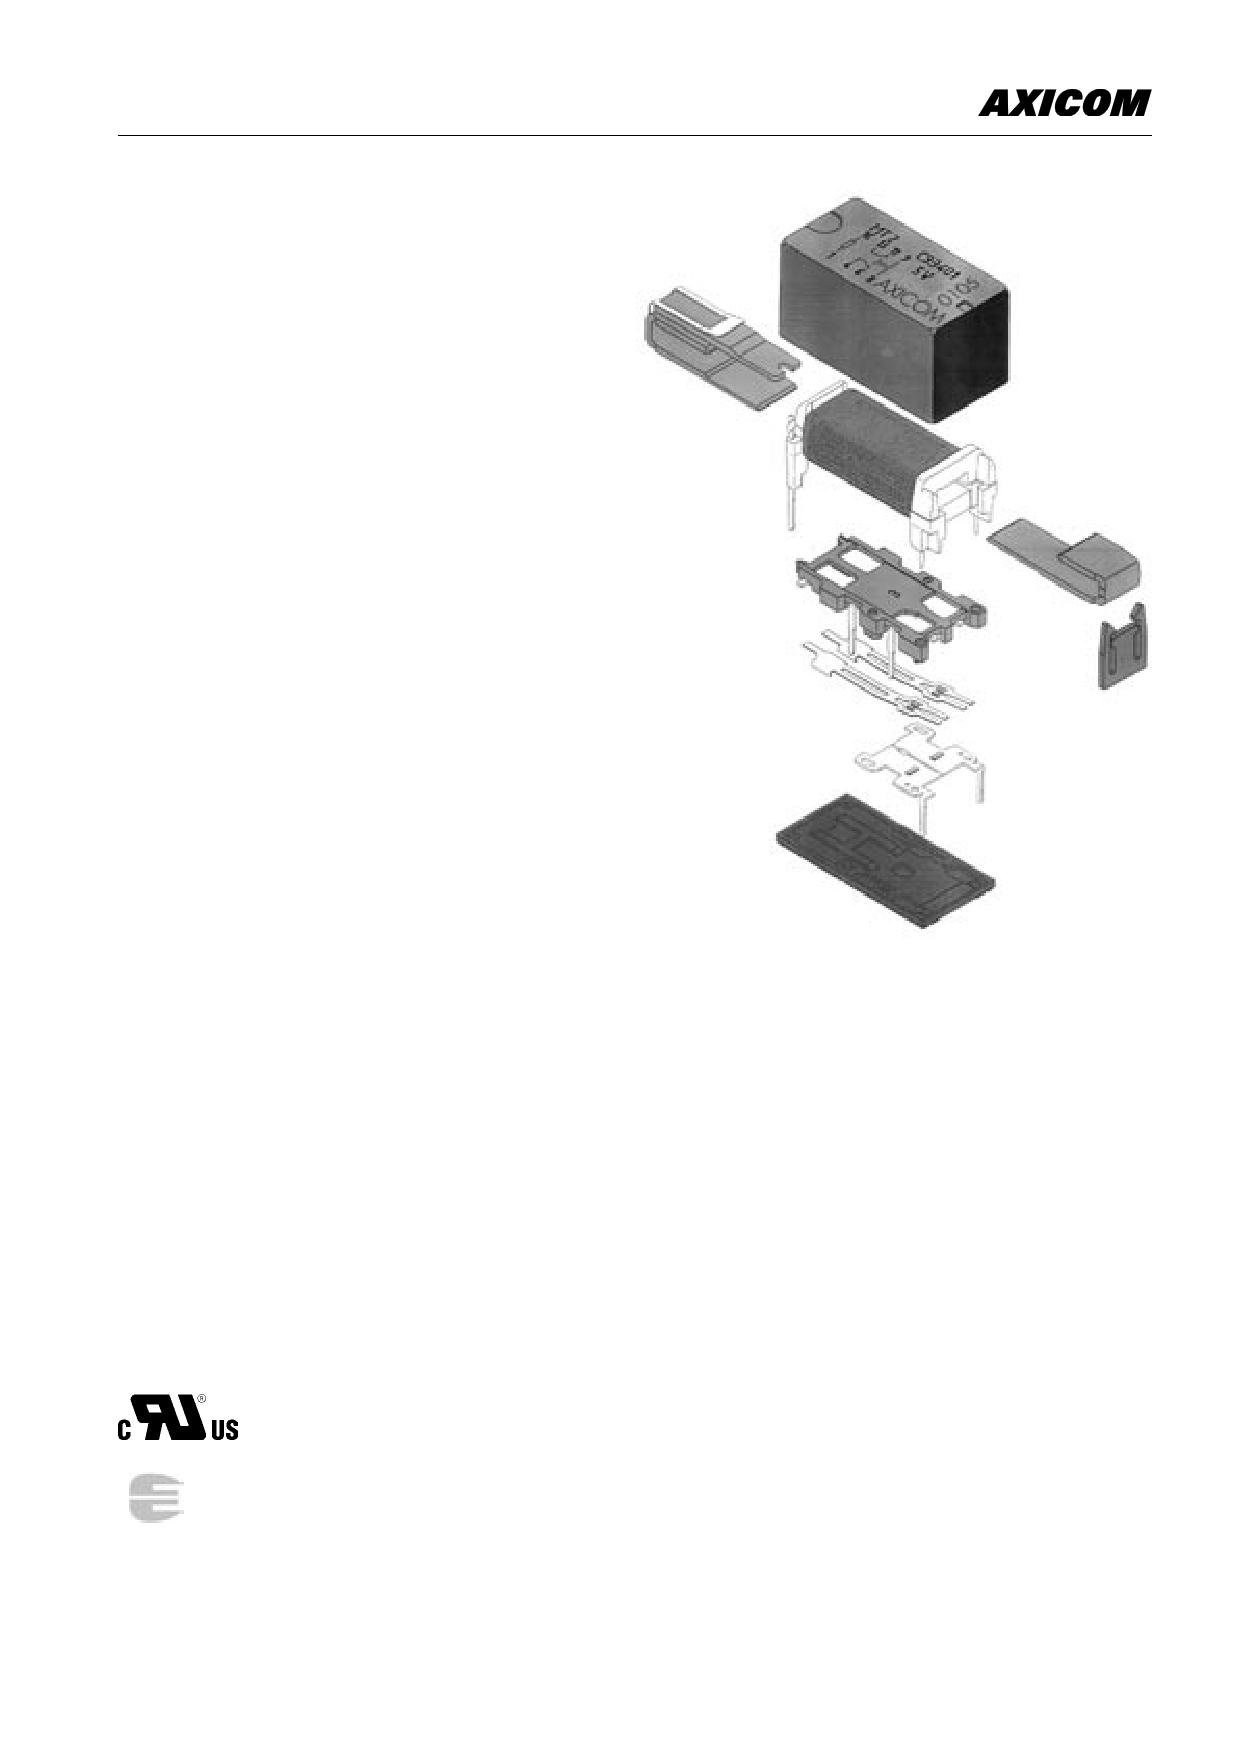 5-1462000-8 Даташит, Описание, Даташиты